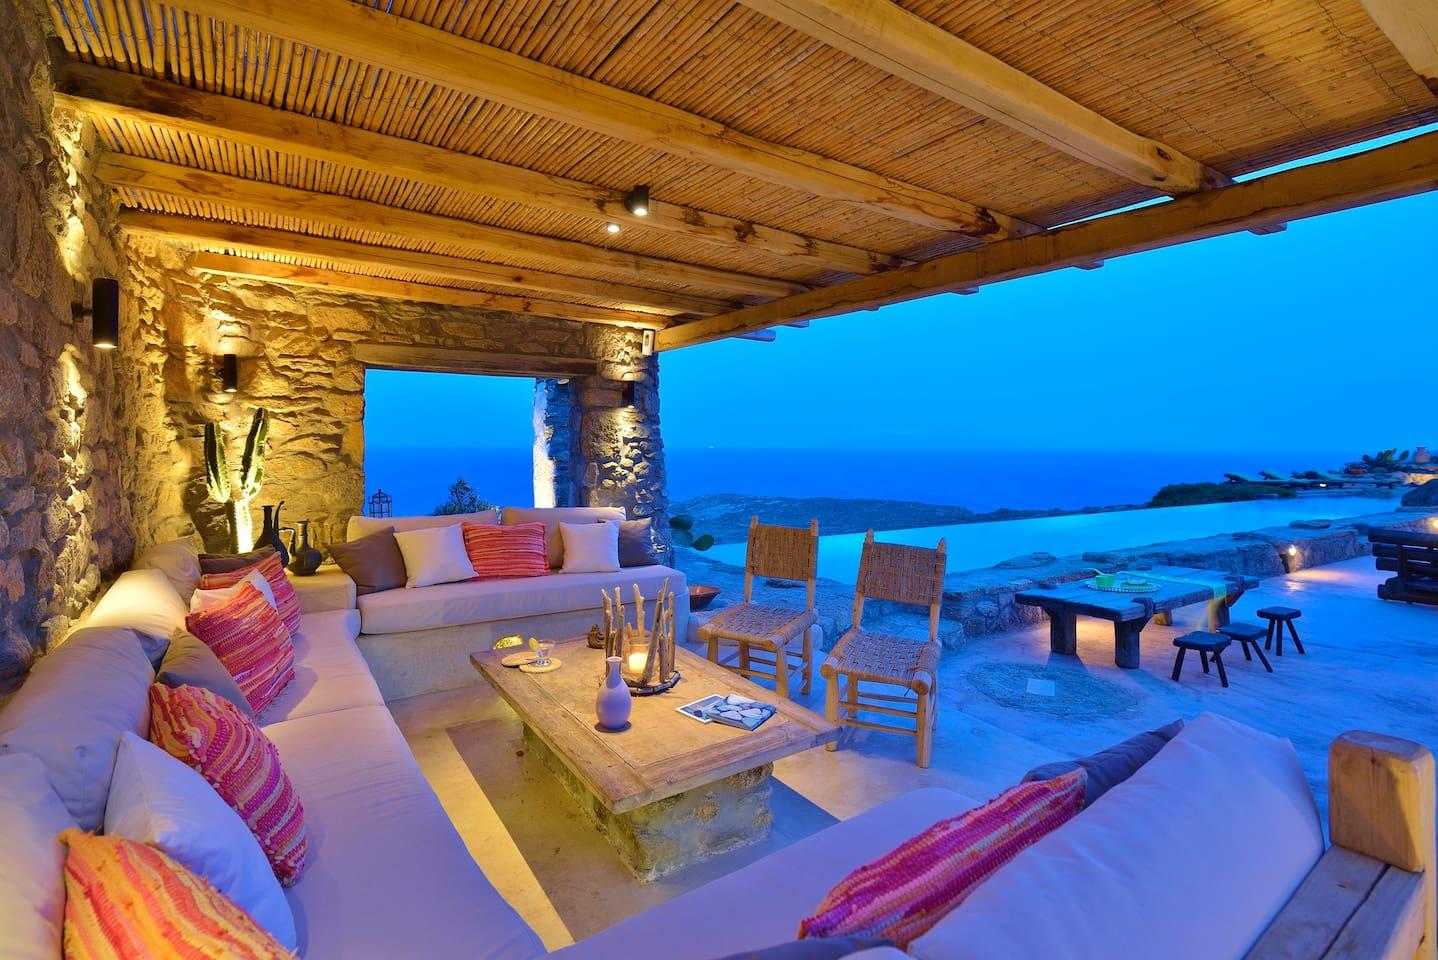 Apartment Spoiling artistic villa - stuning panoramic views photo 16972794